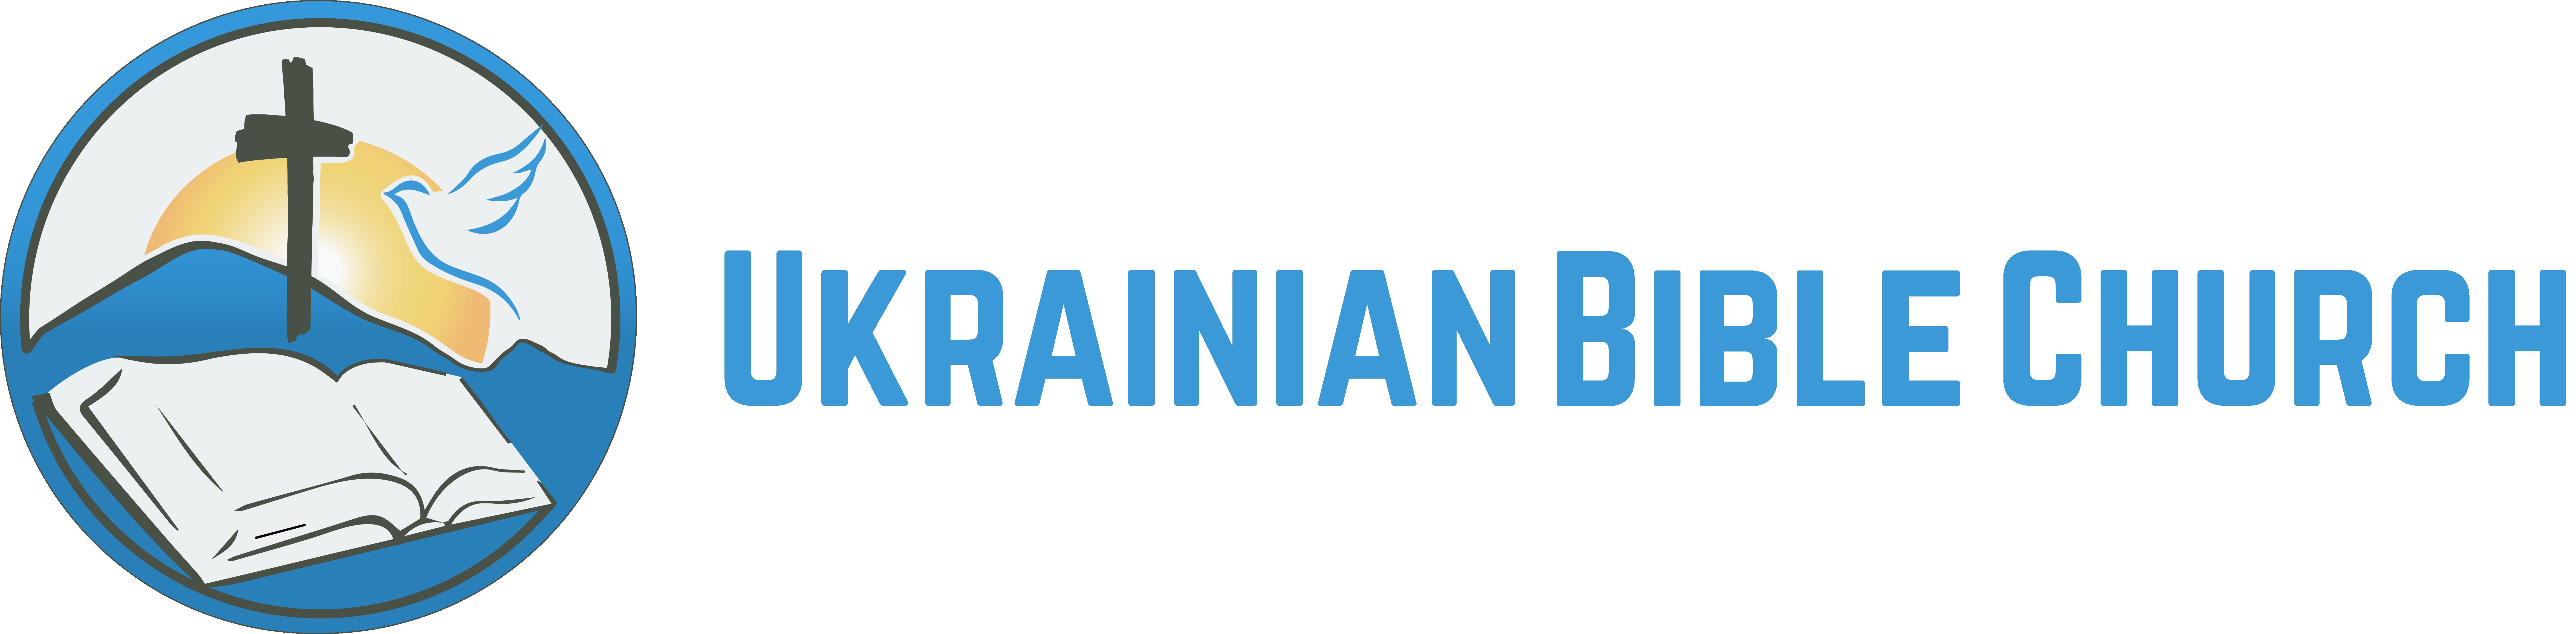 Ukrainian Bible Church of Fairview, OR